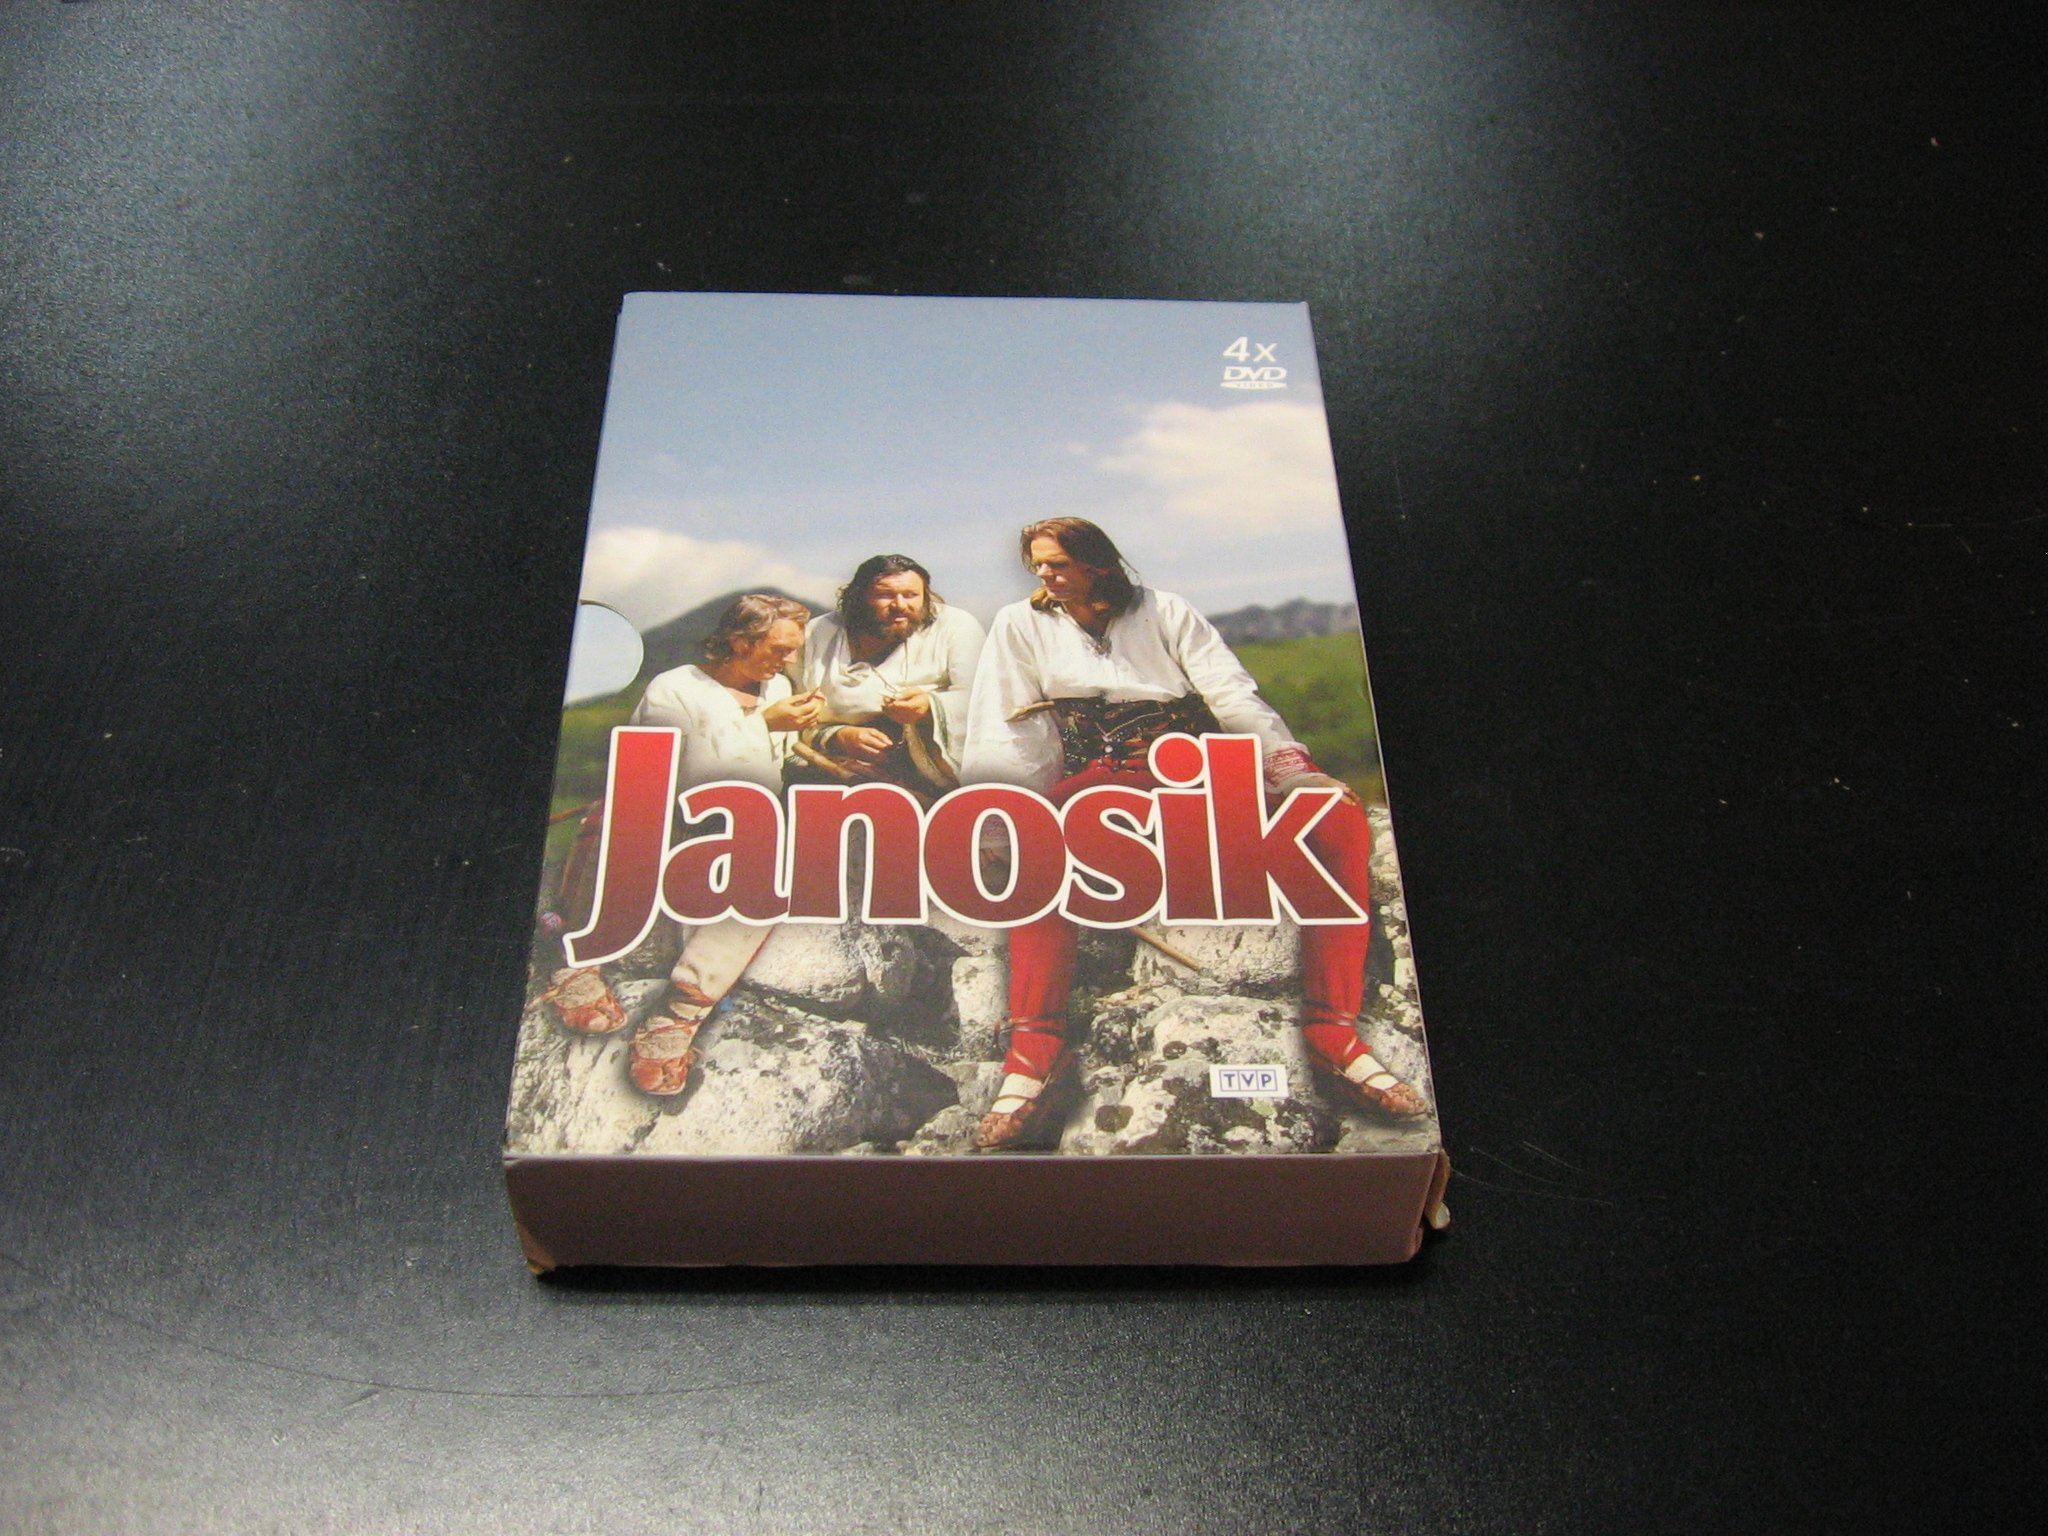 JANOSIK ODCINKI 1-13 (4DVD) - Sklep